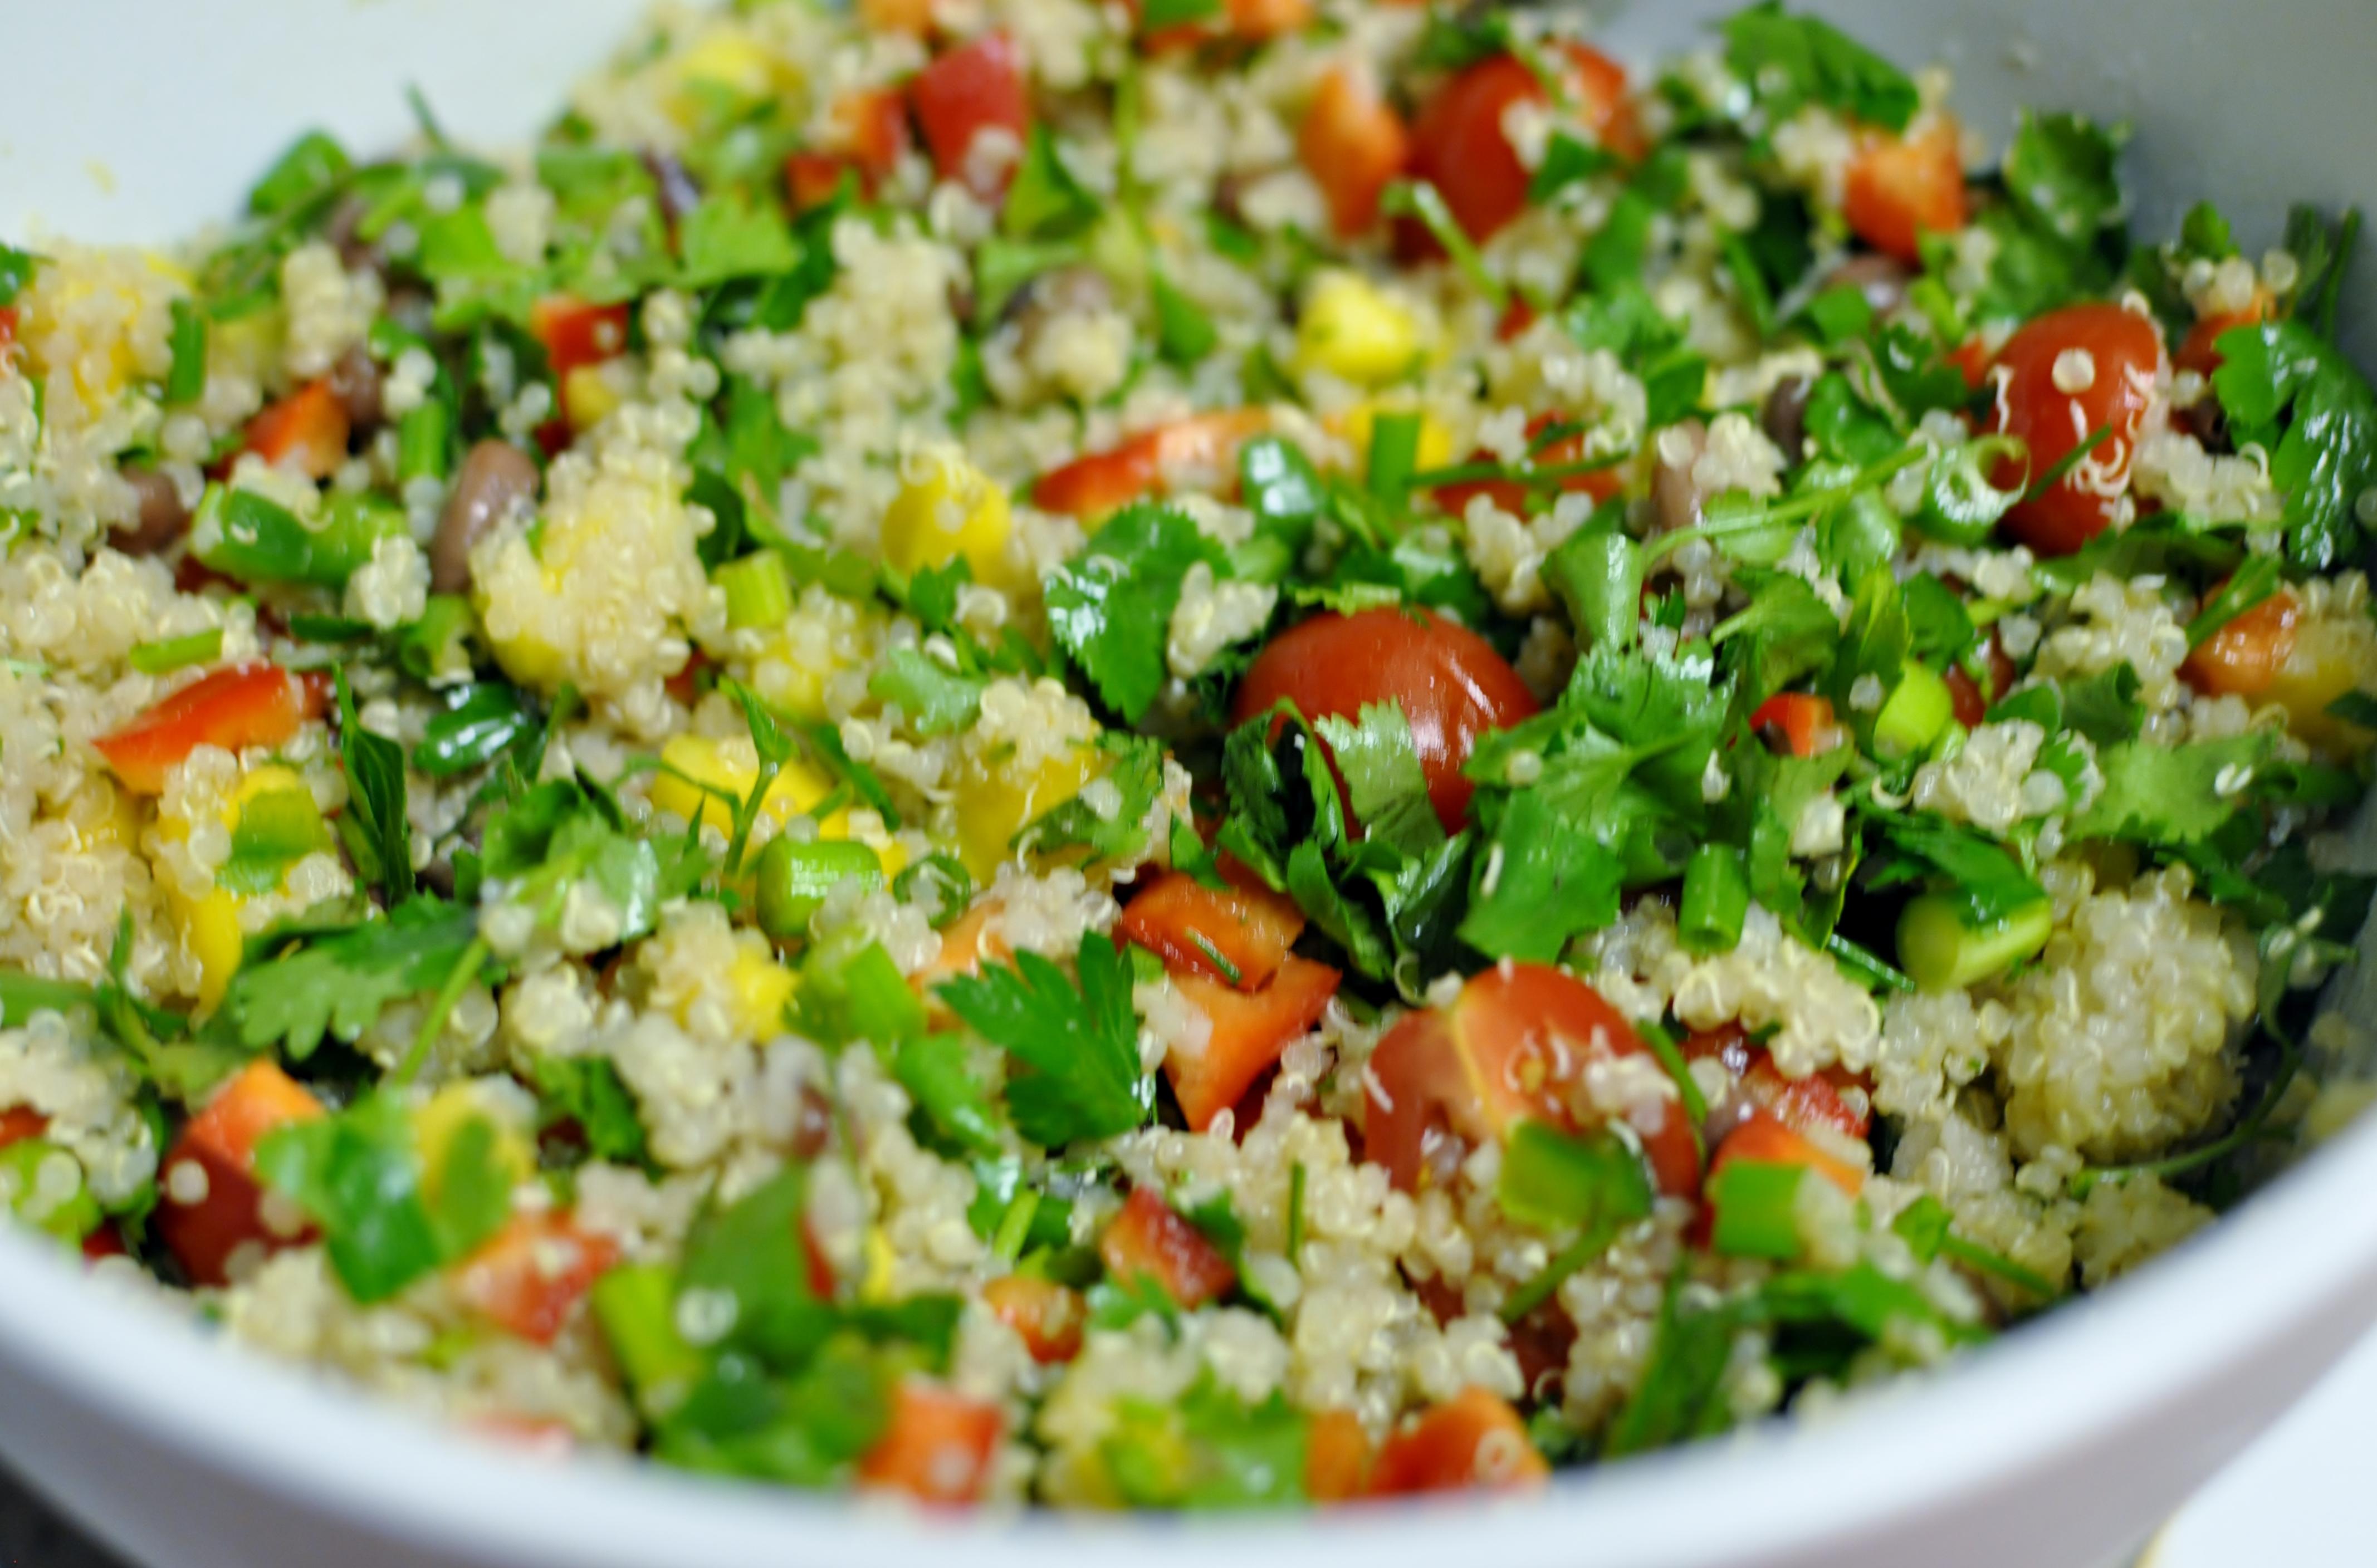 Quinoa Salad Cilantro That this salad is good onQuinoa Salad Cilantro